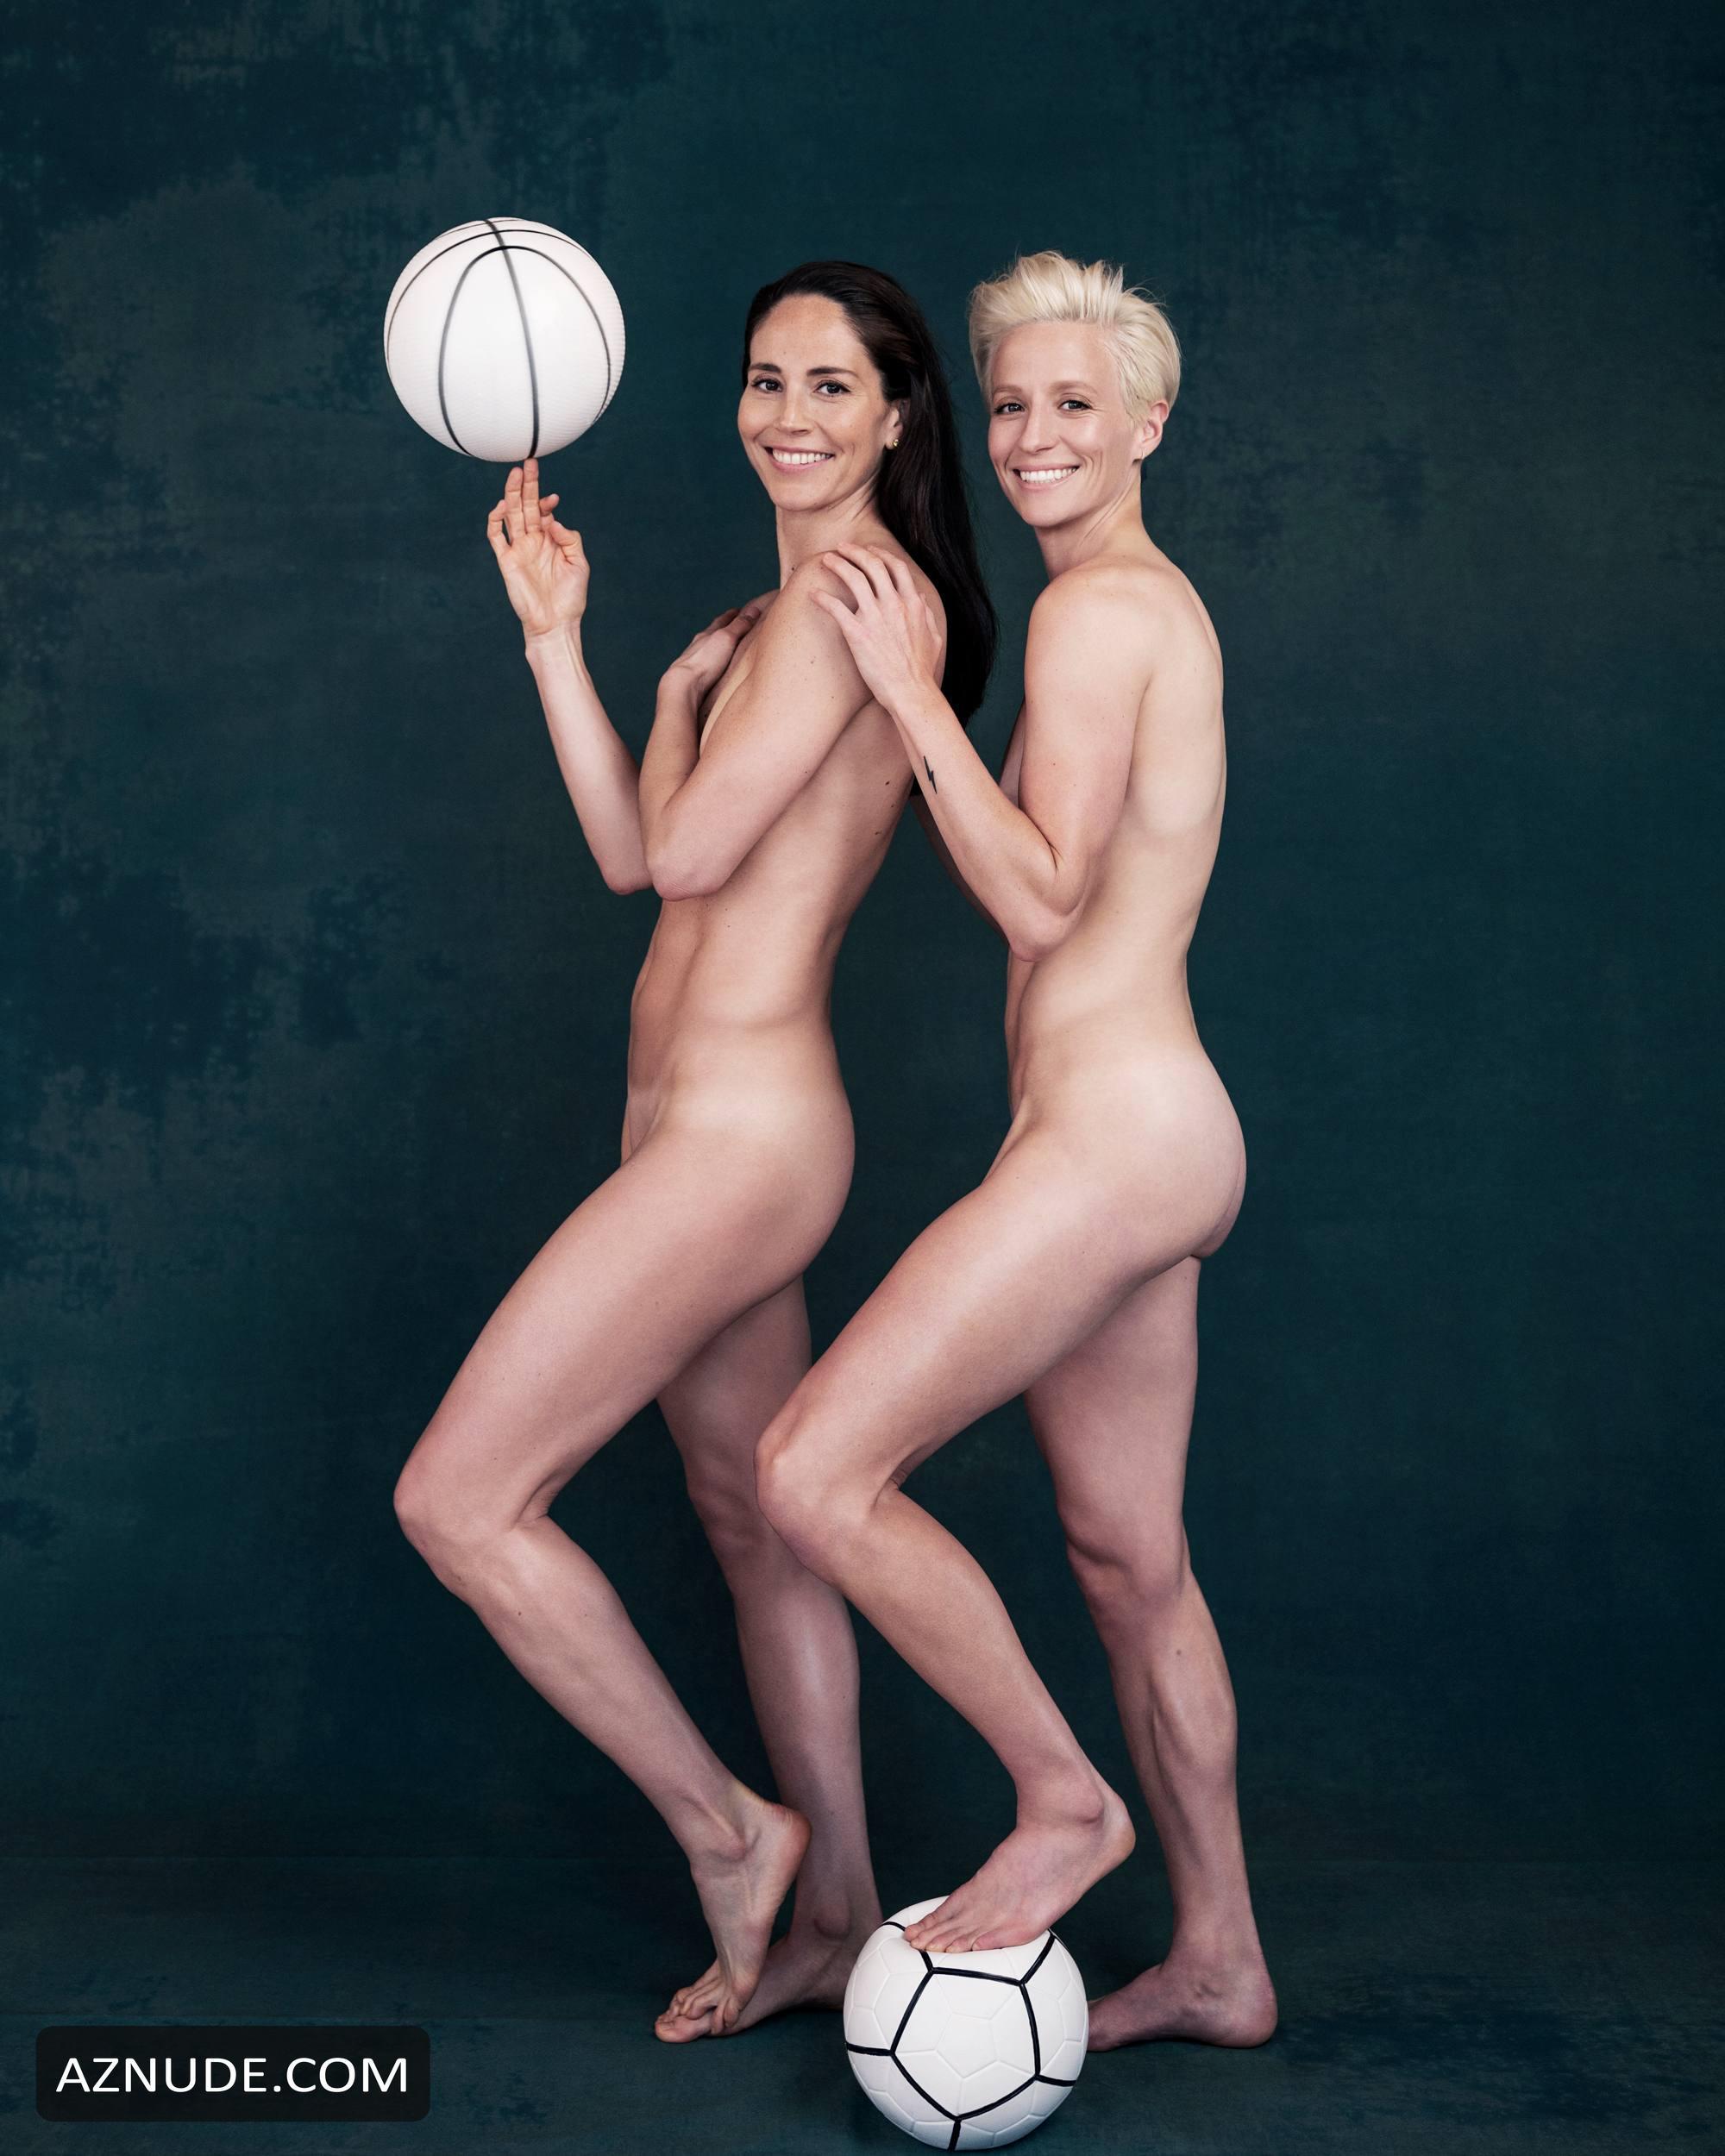 Sue Bird And Footballer Megan Rapinoe Were Photographed -9425